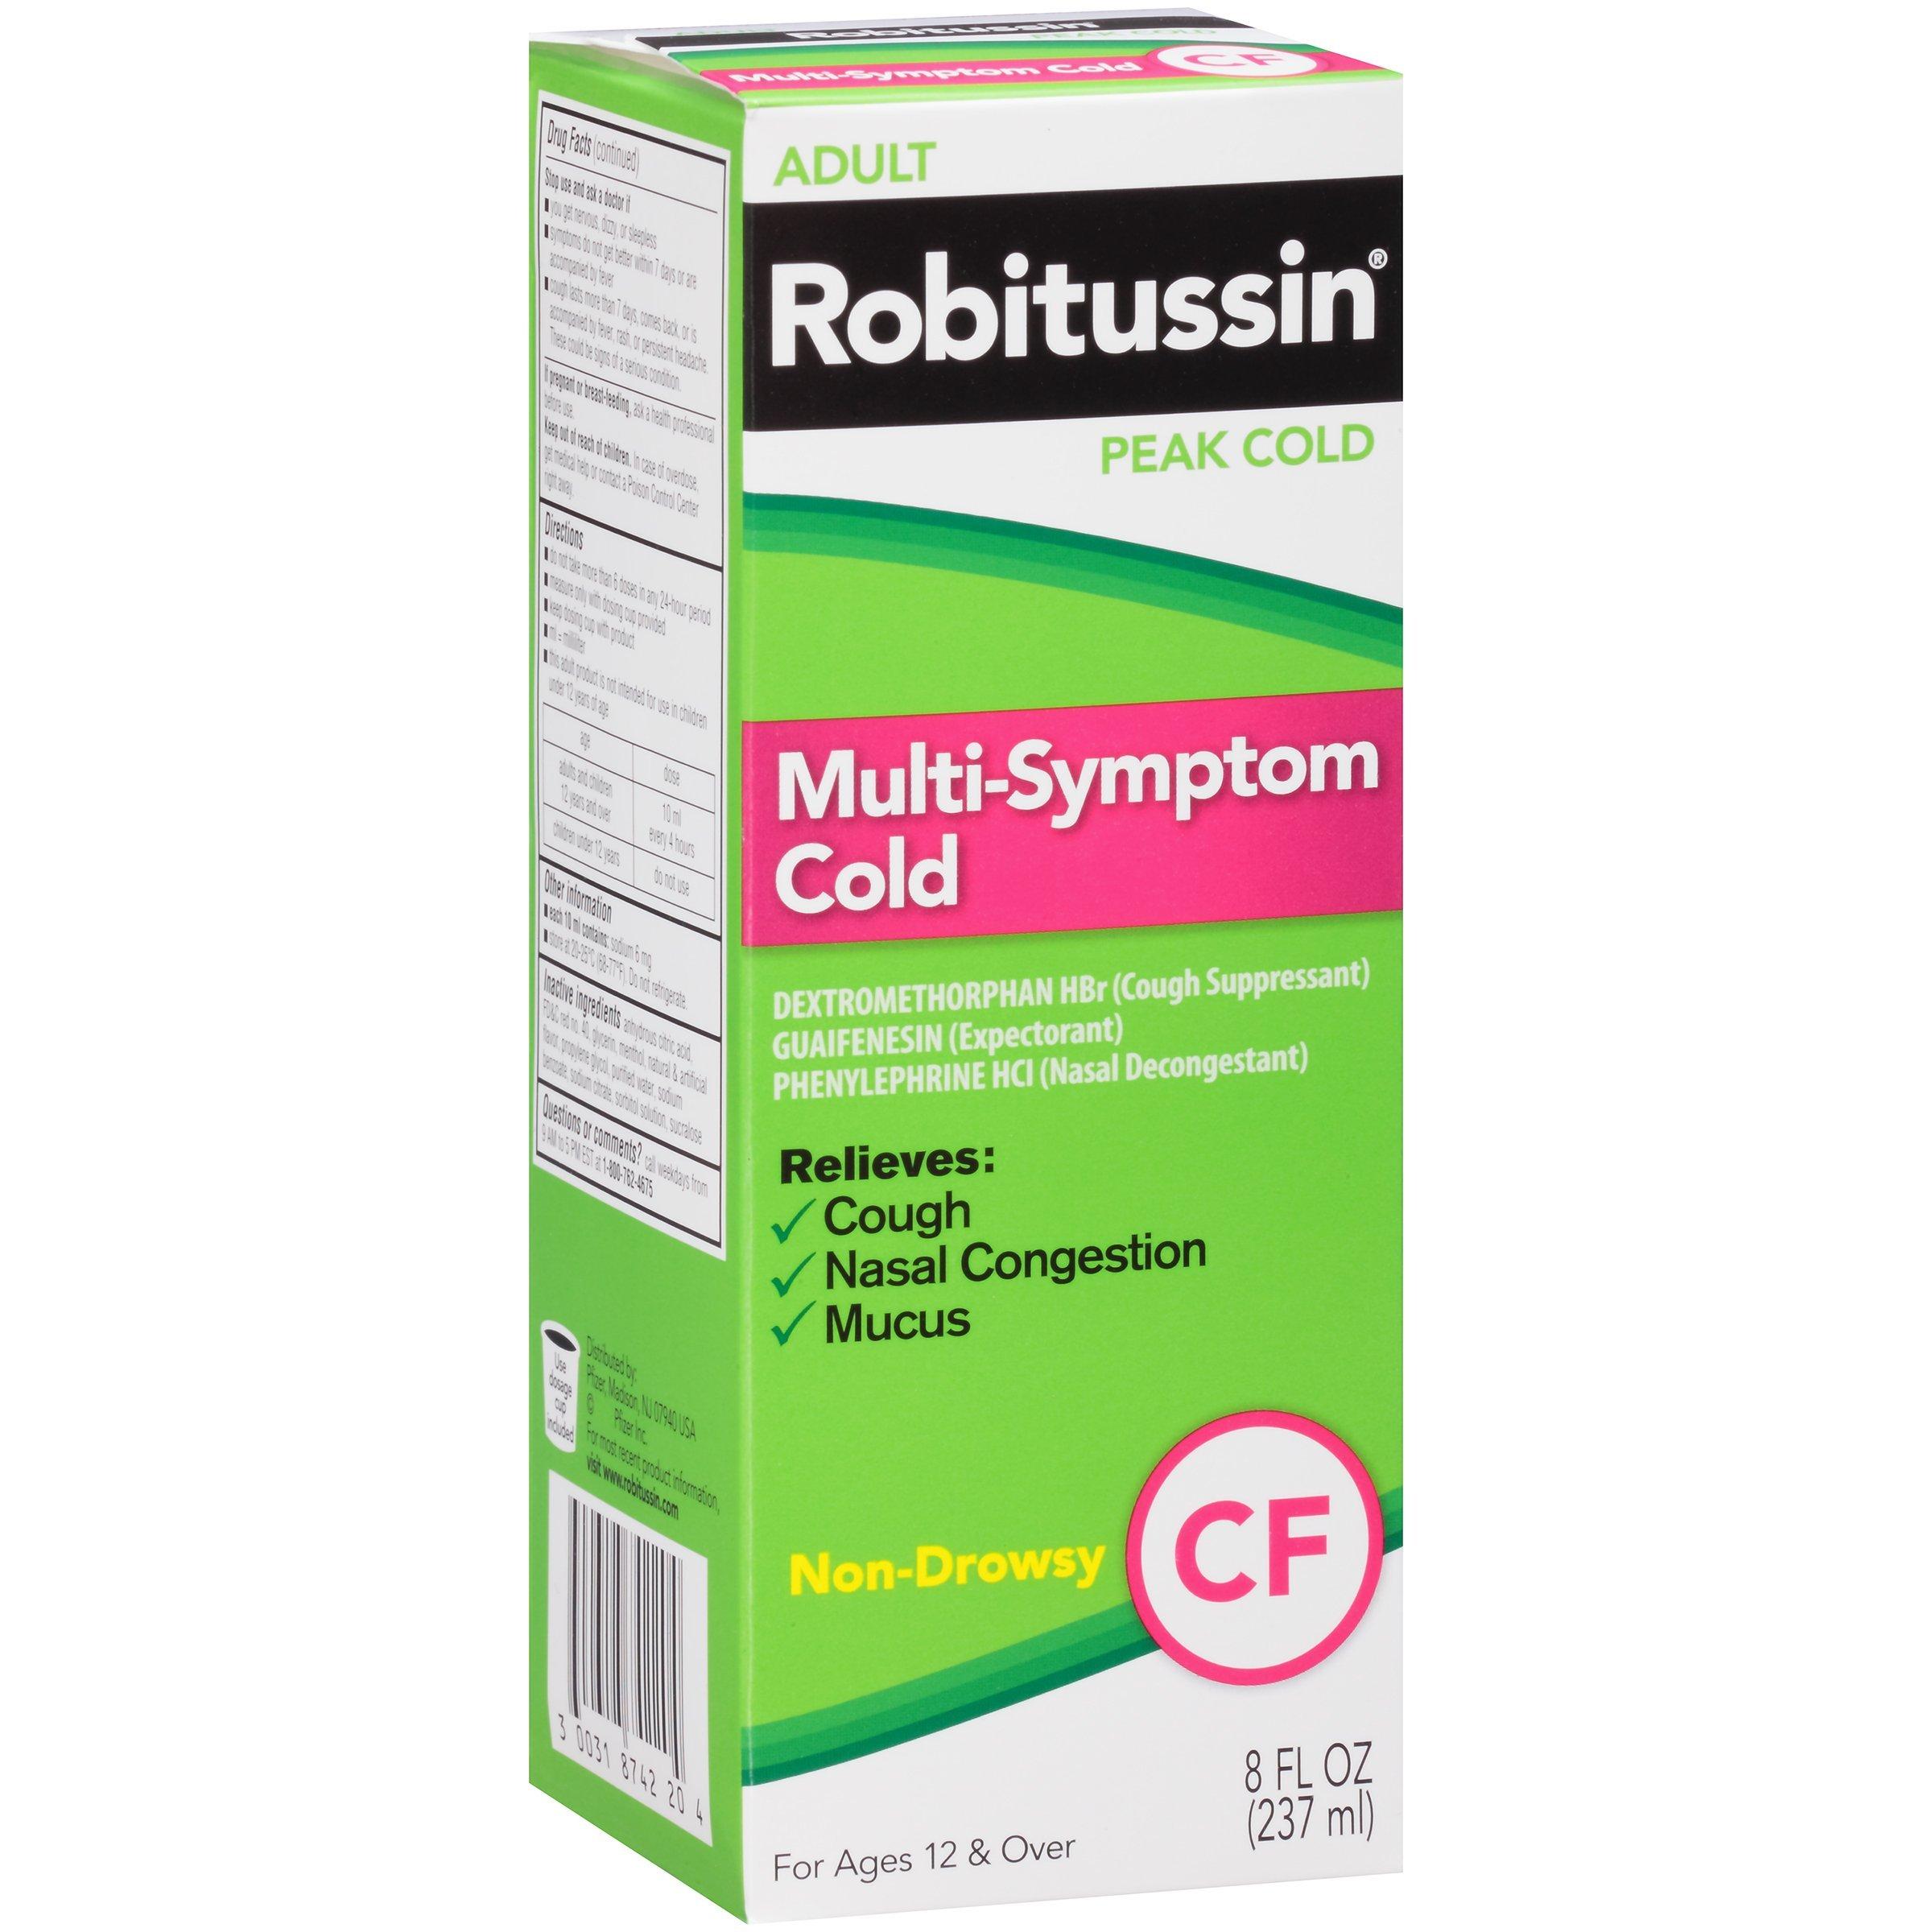 Robitussin Peak Cold CF Multi-Symptom Cold Relief (8 fl. oz. Bottle, Pack of 12)